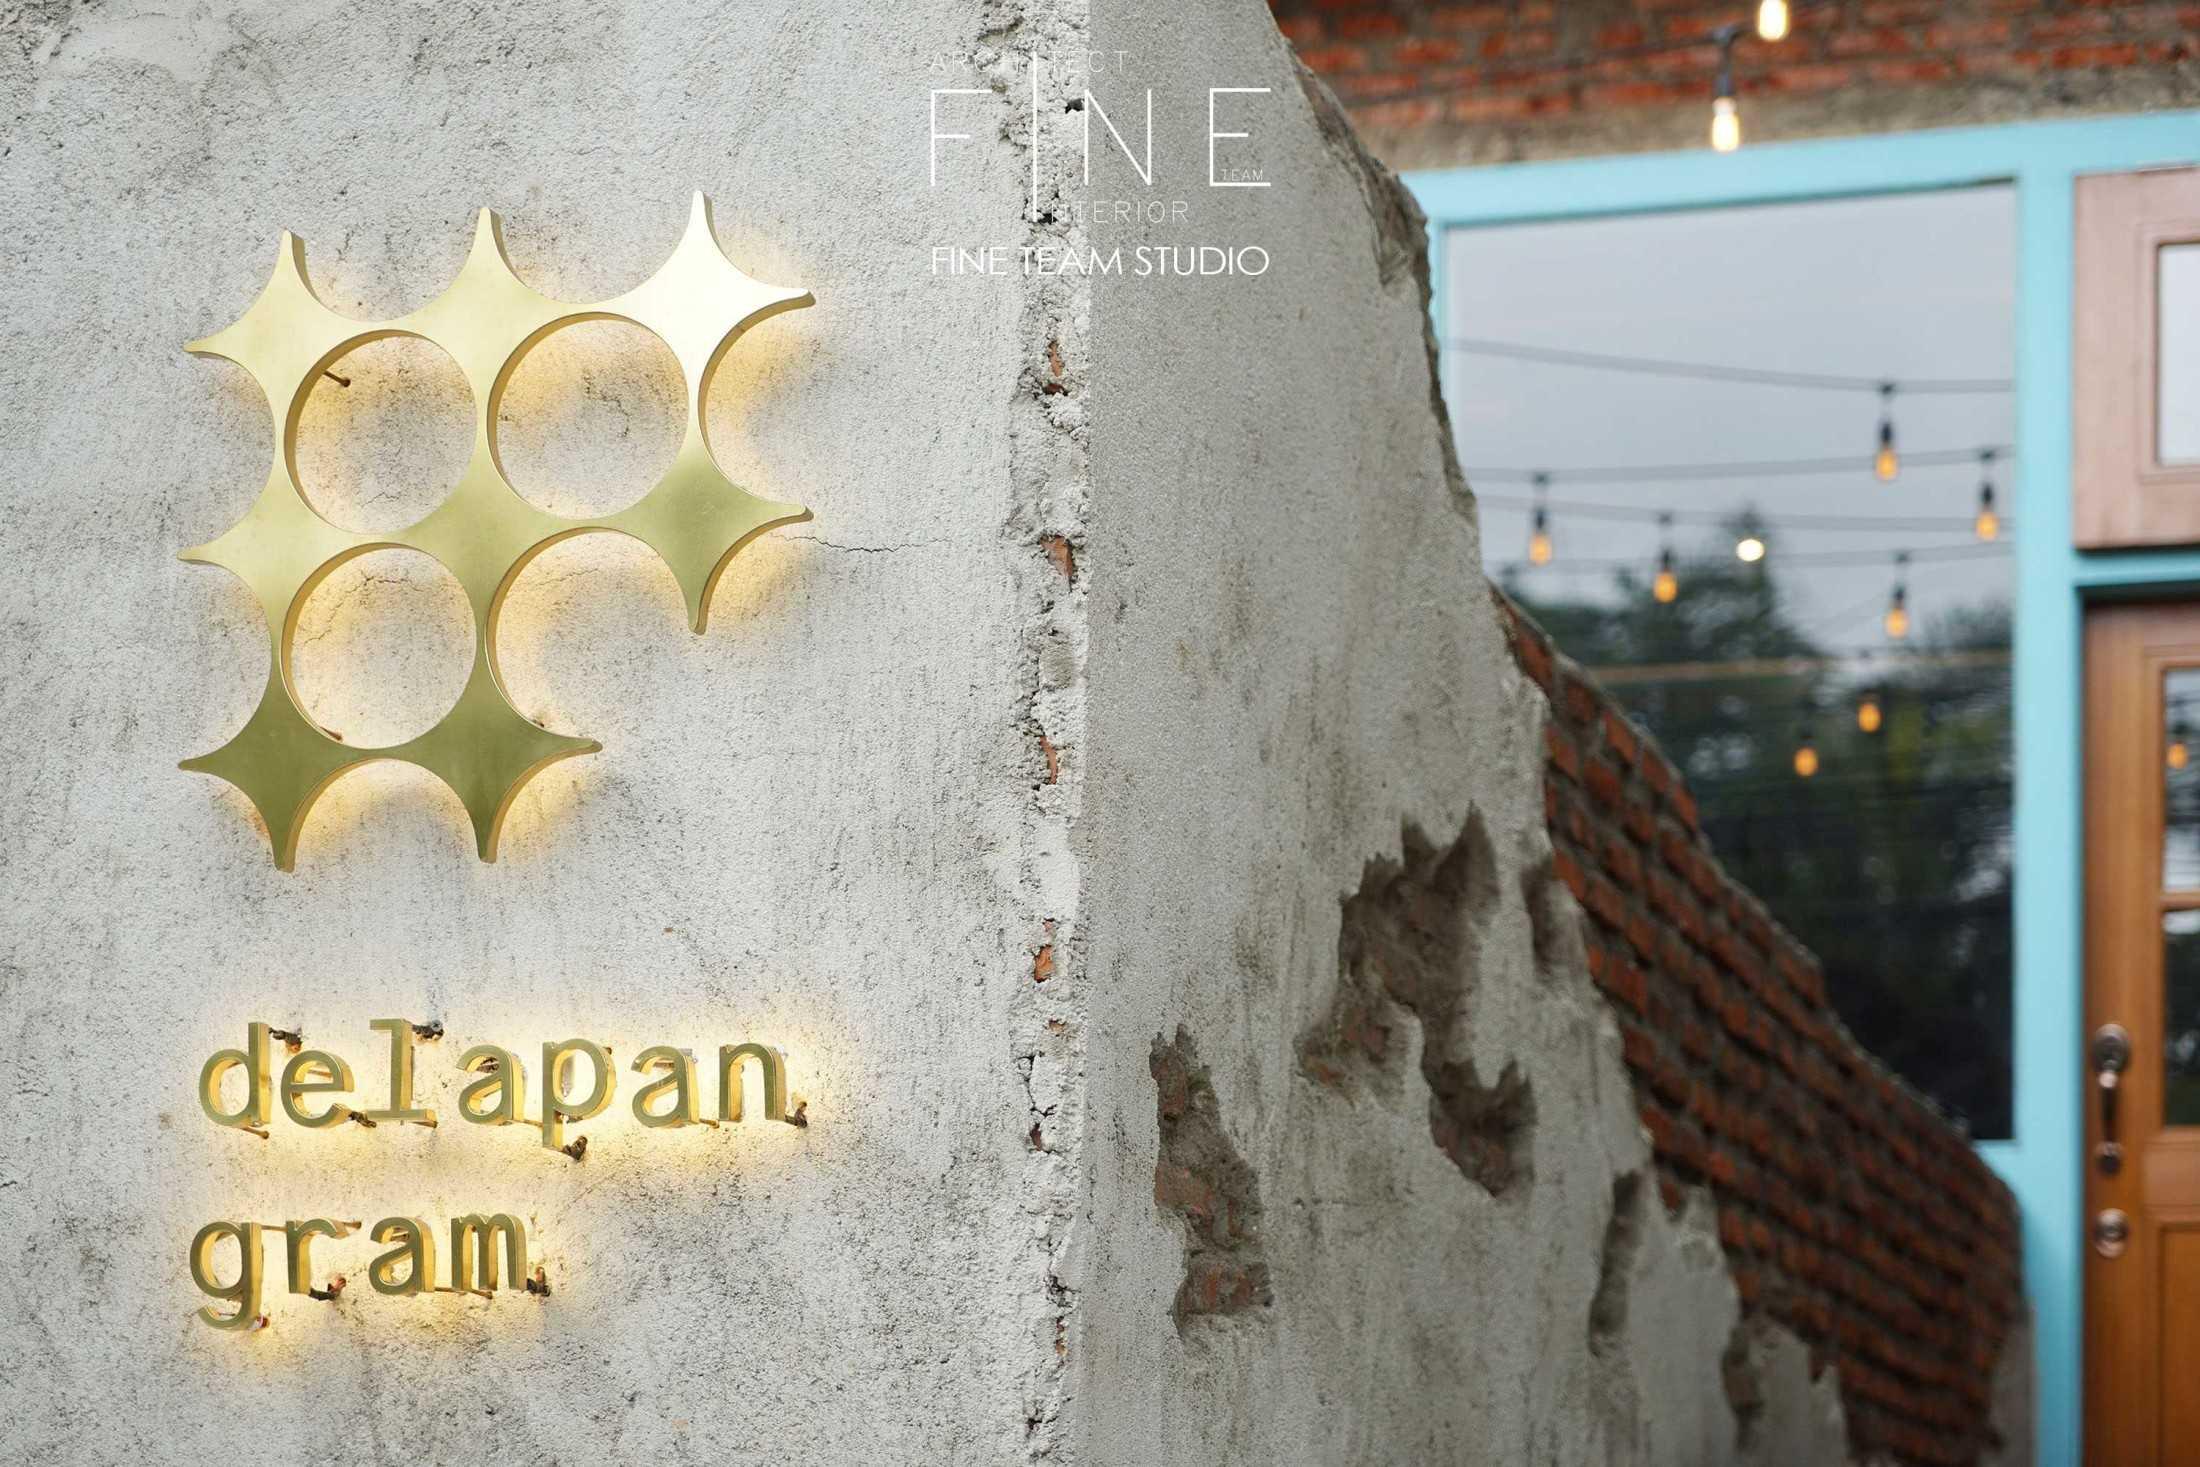 Fine Team Studio Delapan Gram Blok O, Jl. Pluit Karang Bar. No.6 No. 14, Rt.2/rw.8, Pluit, Penjaringan, Jakarta, Daerah Khusus Ibukota Jakarta 14450, Indonesia Blok O, Jl. Pluit Karang Bar. No.6 No. 14, Rt.2/rw.8, Pluit, Penjaringan, Jakarta, Daerah Khusus Ibukota Jakarta 14450, Indonesia Fine-Team-Studio-Delapan-Gram Industrial 56089